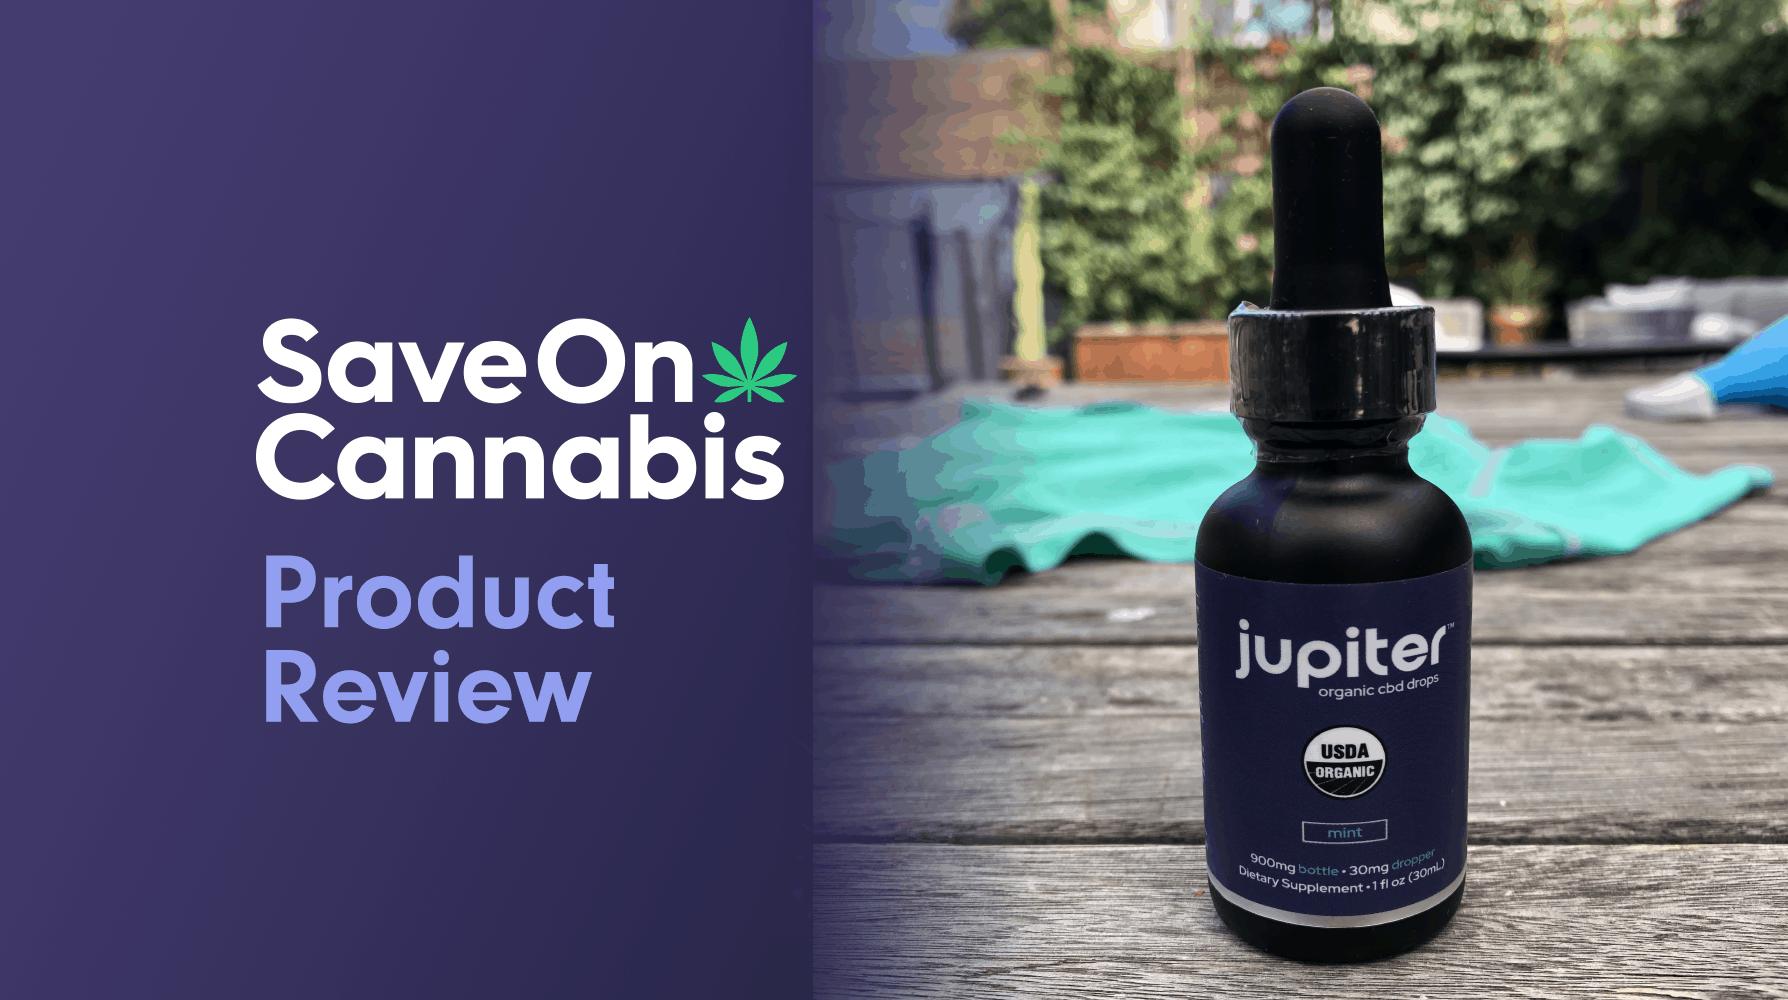 jupiter organic cbd drops mint 900 mg save on cannabis website